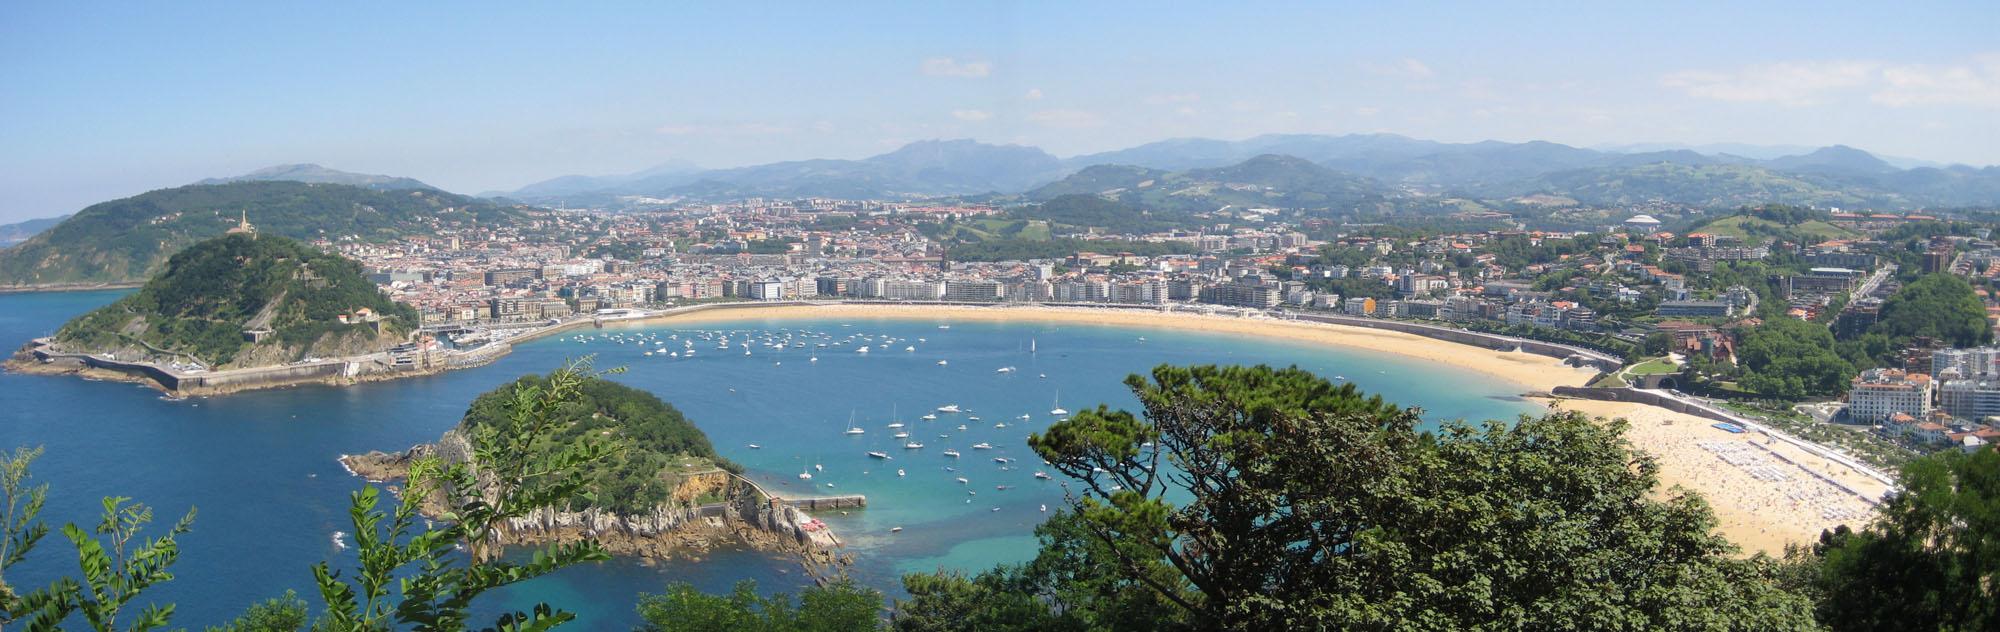 País Vasco: San Sebastián